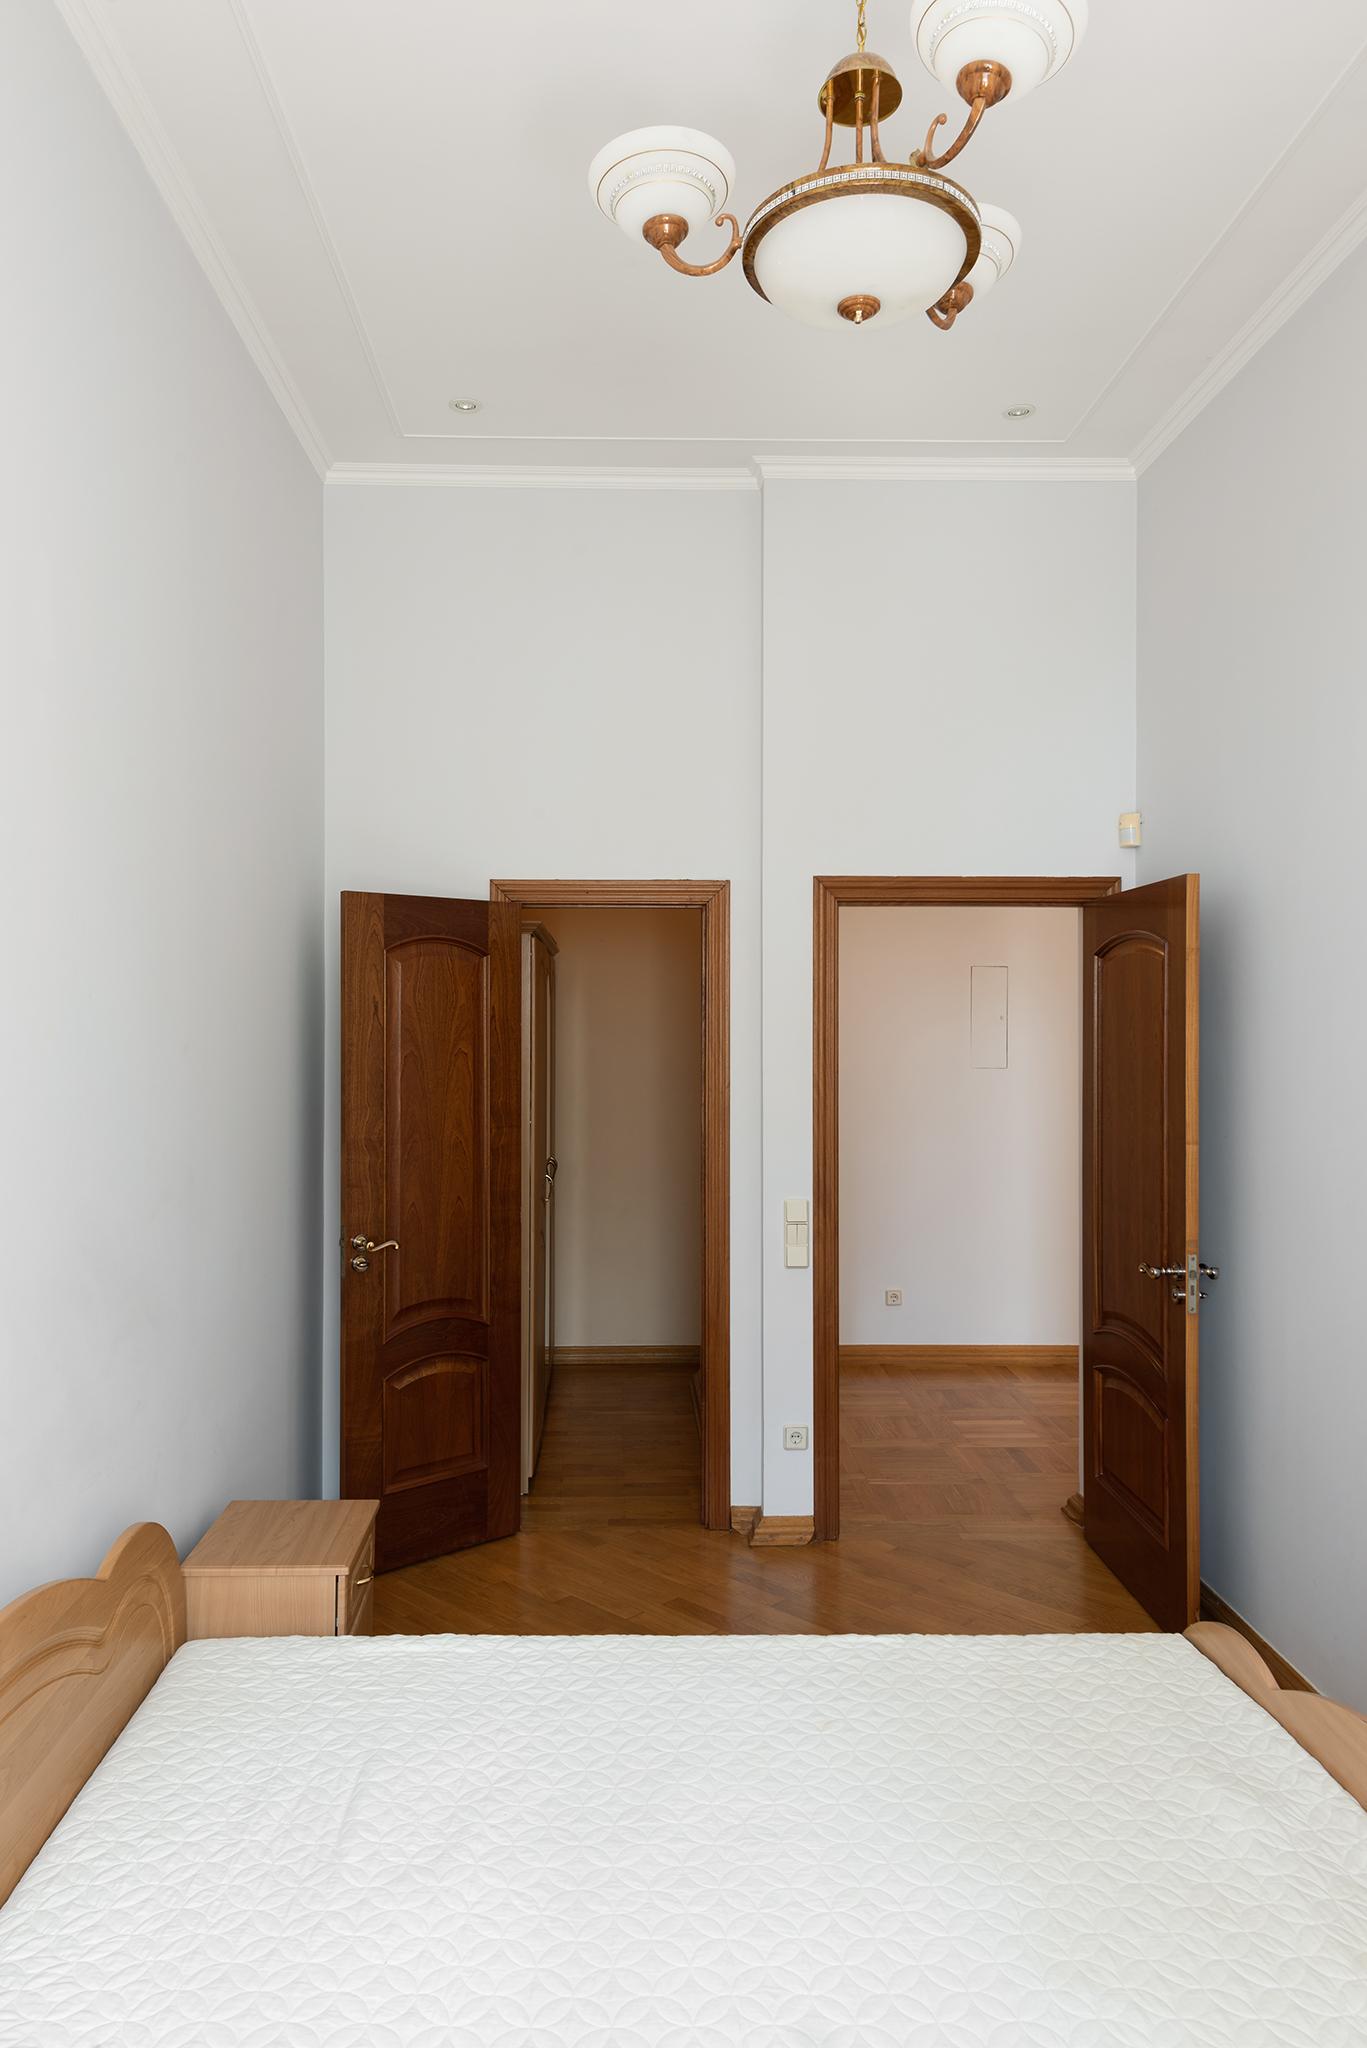 Investissement Immobilier Kiev, Ukraine - Chambre